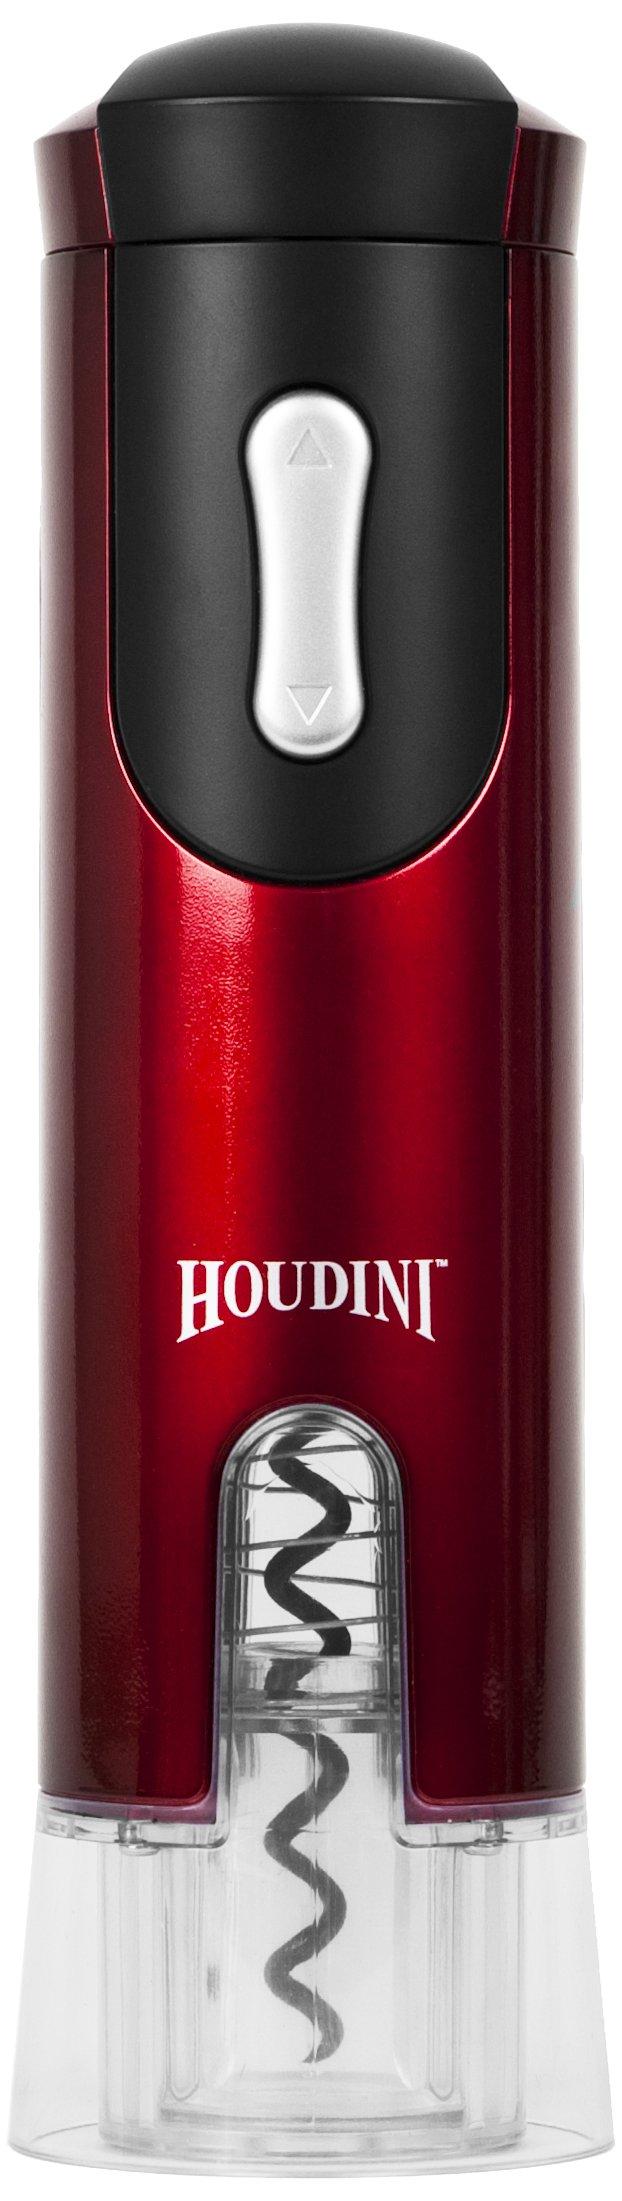 Houdini Electric Corkscrew (Metallic Red)